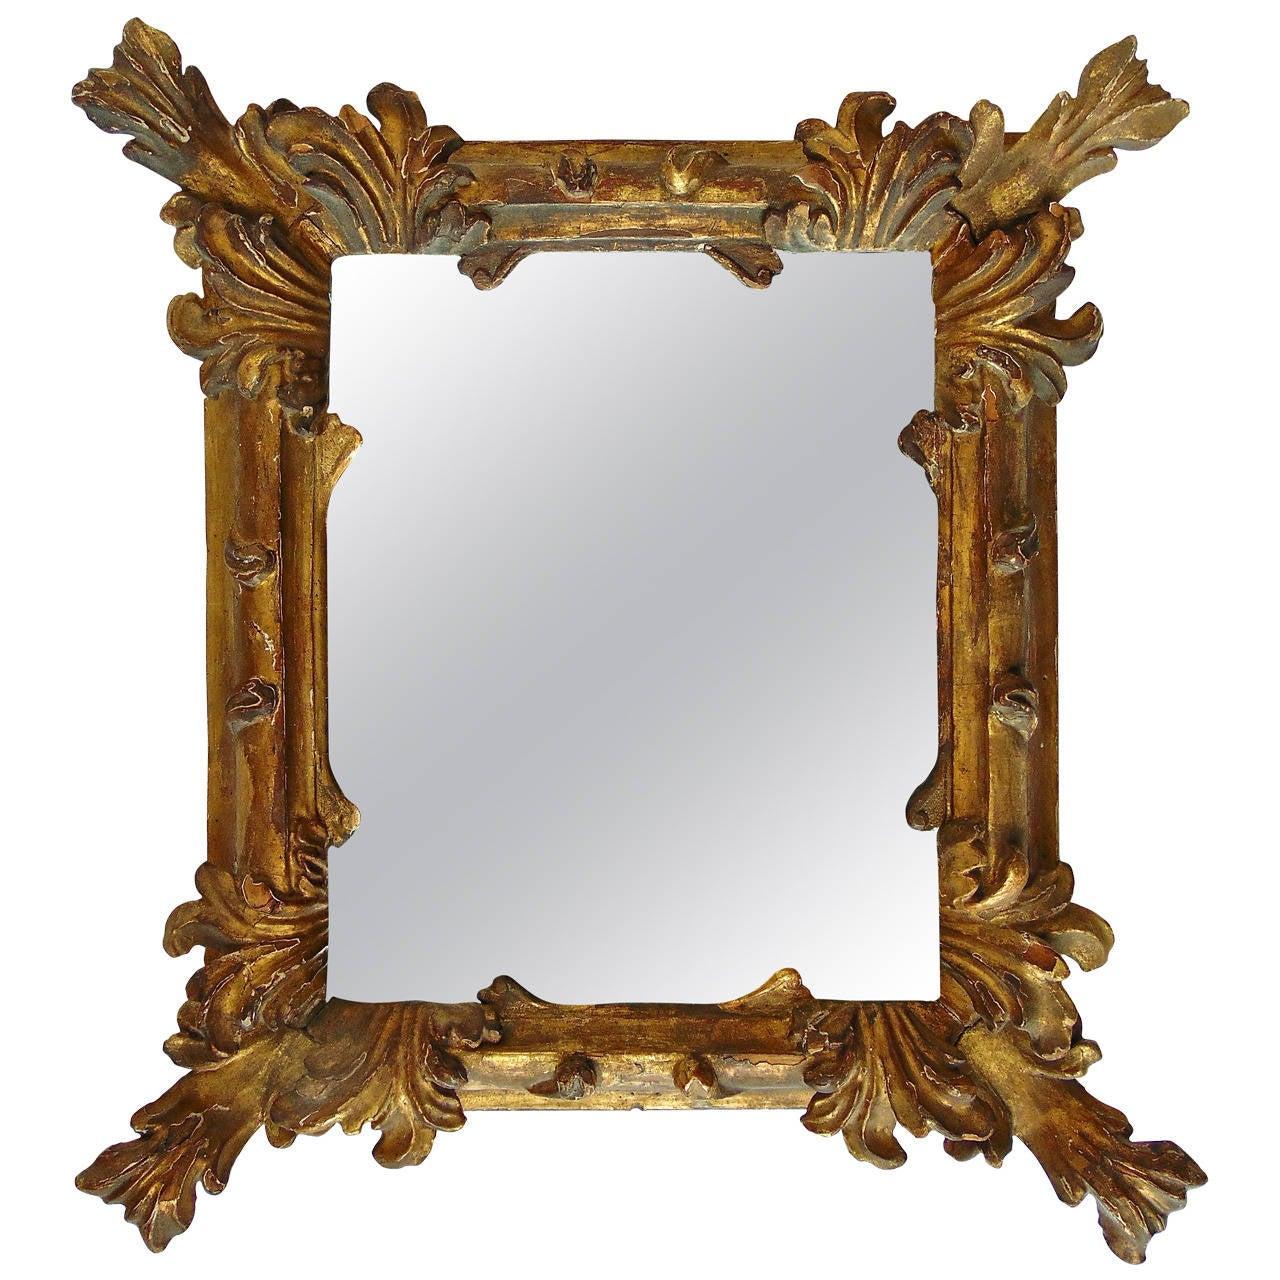 Period 18th century italian baroque carved gilt mirror at for Italian baroque mirror